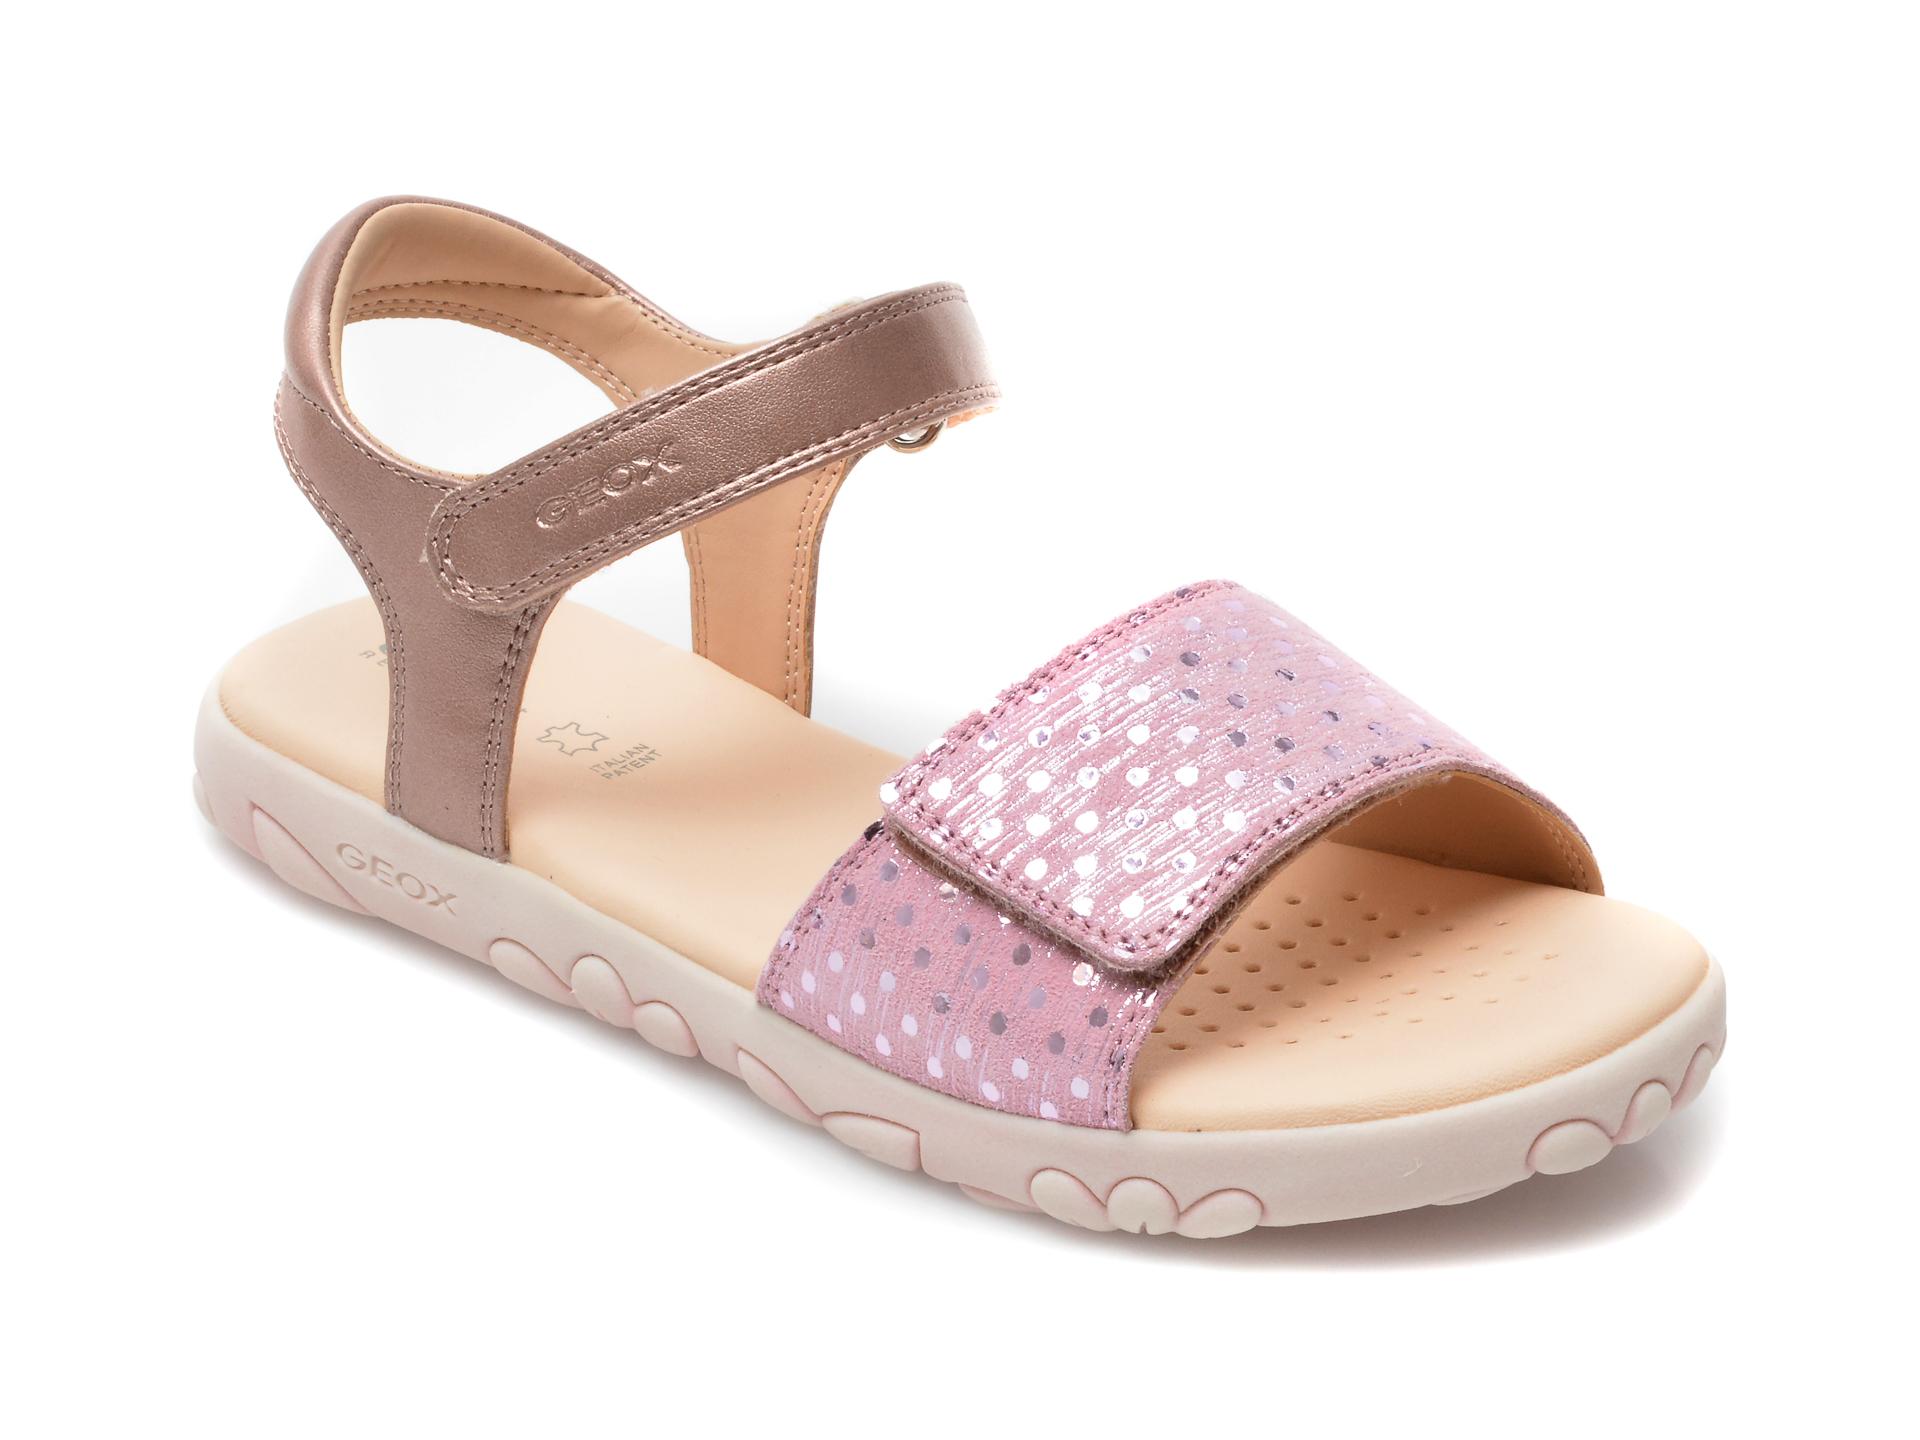 Sandale GEOX roz, J028ZA, din piele naturala